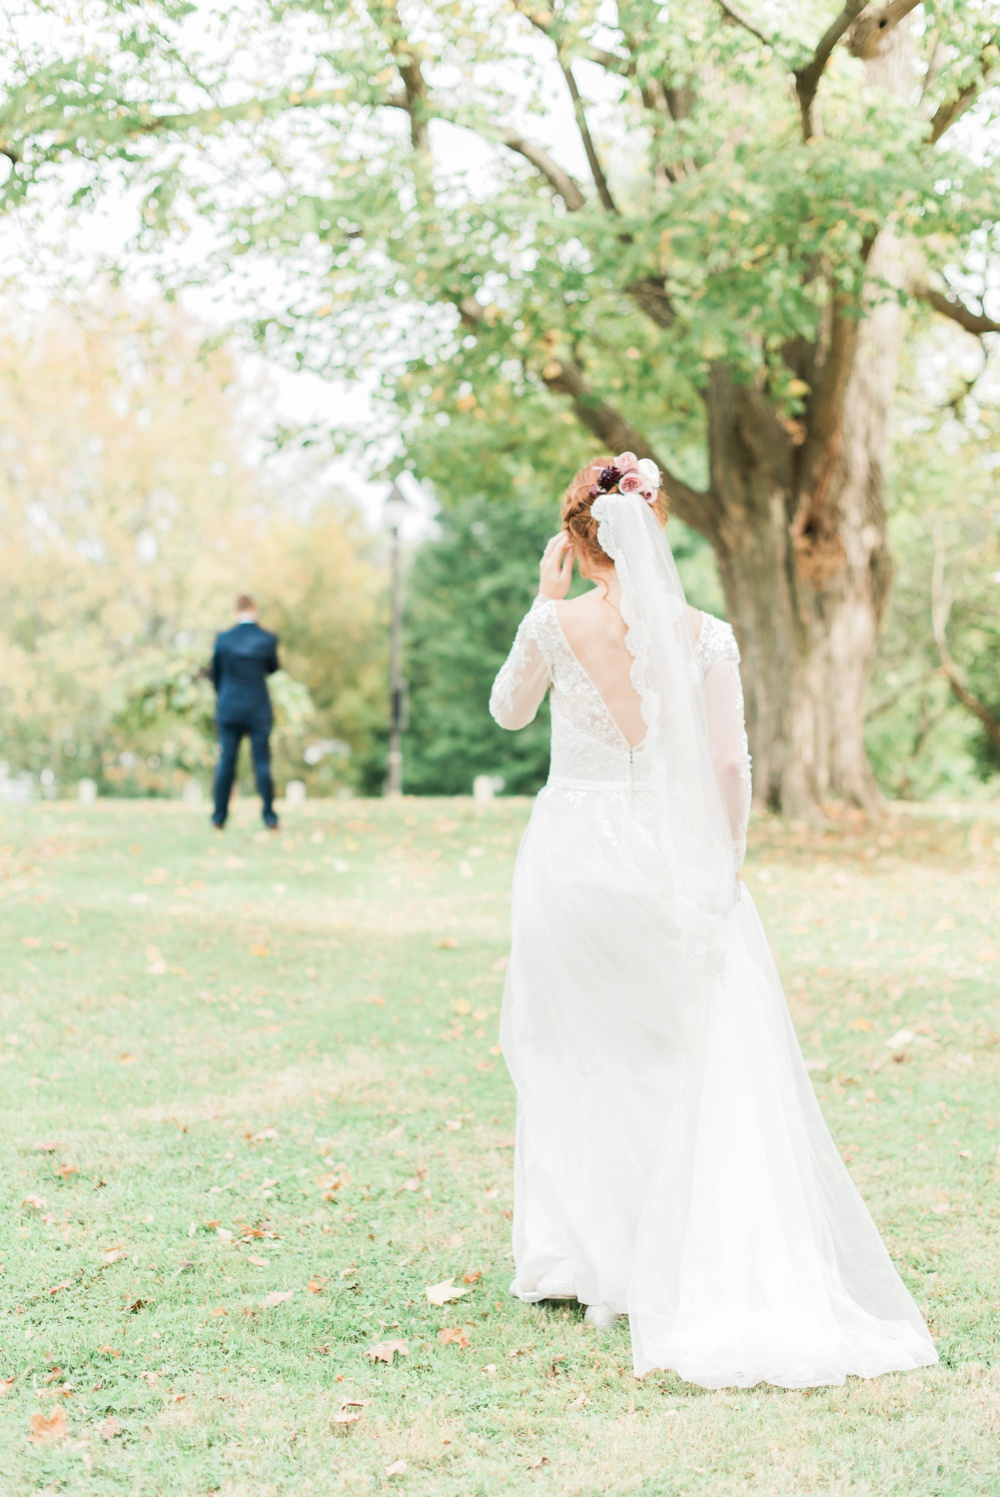 ohio-university-walter-hall-wedding-athens-anna-mark_0028.jpg